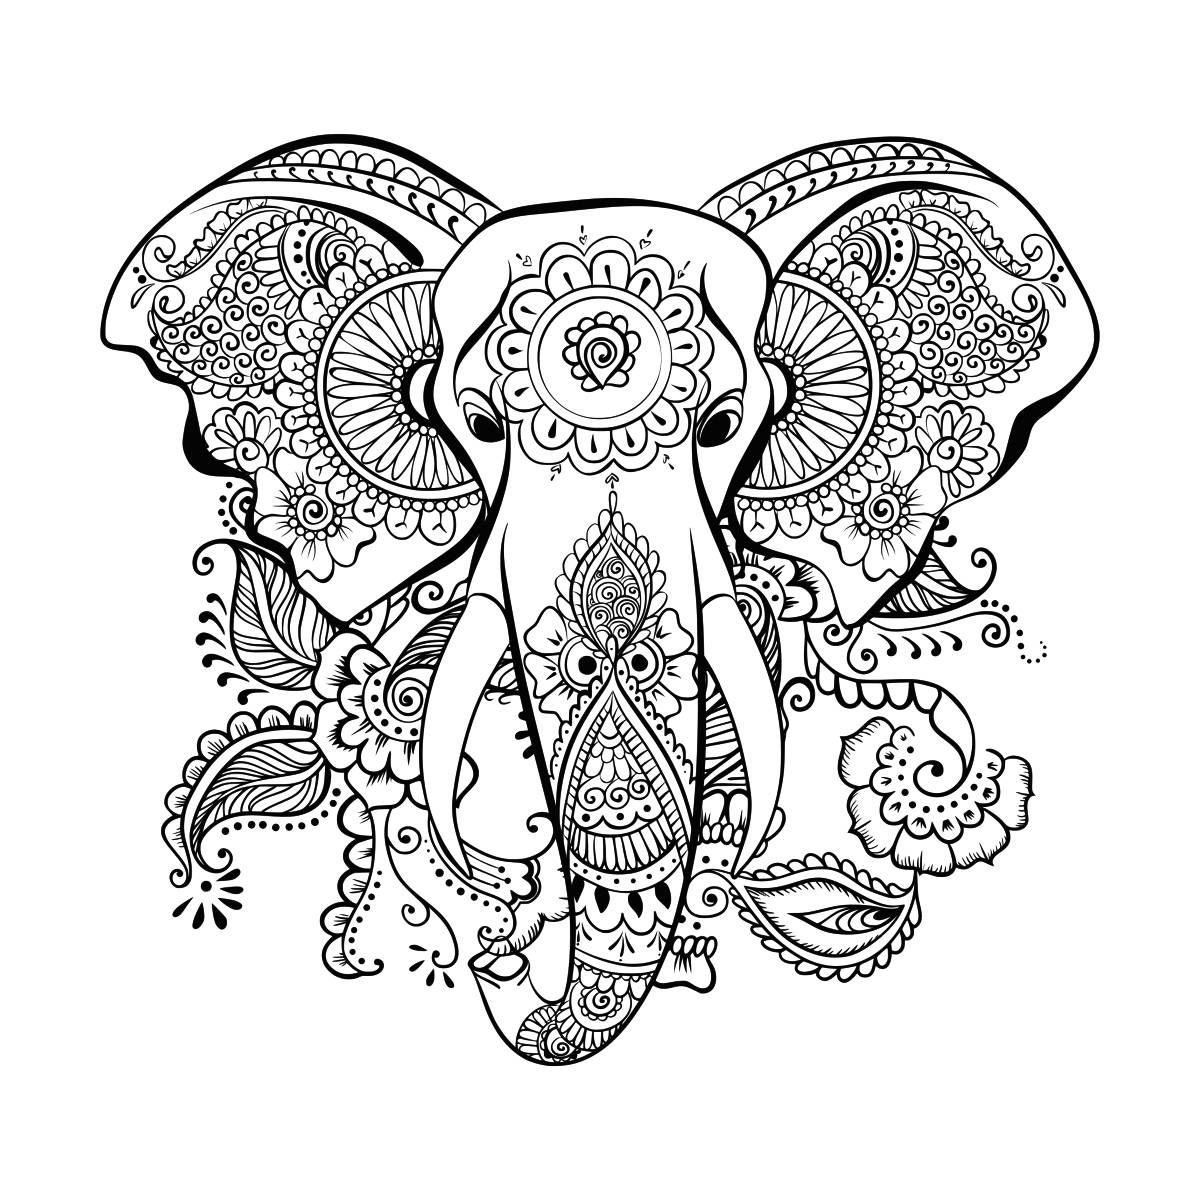 Ausmalbilder Auto Just Married : Ethnic Elephant Svg Mandala Elephant Svg Elephant Head Svg Zentangle